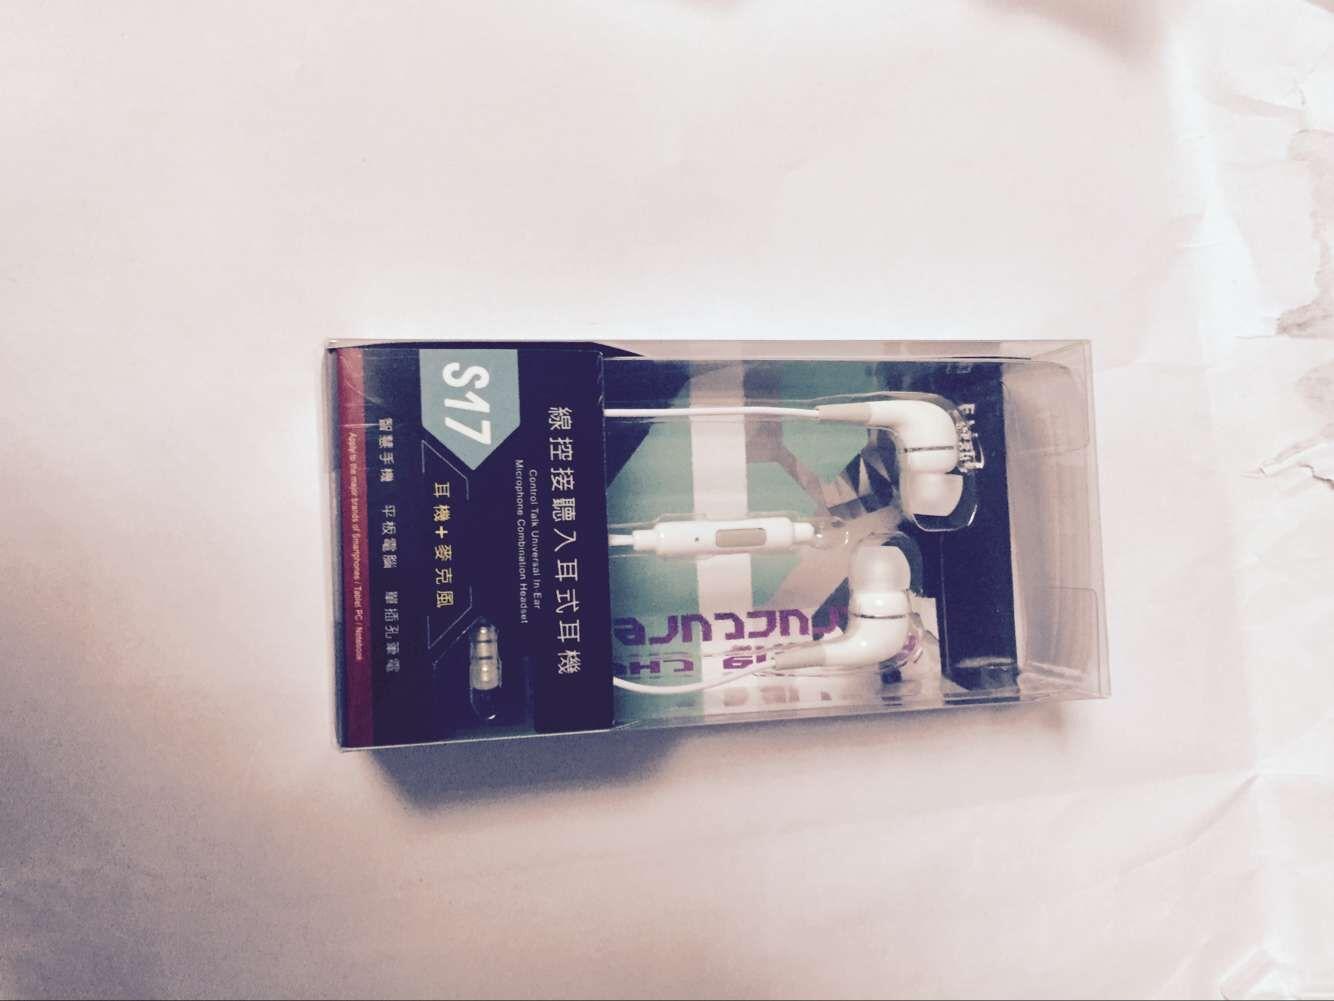 EARPHONE Prton PBH-100